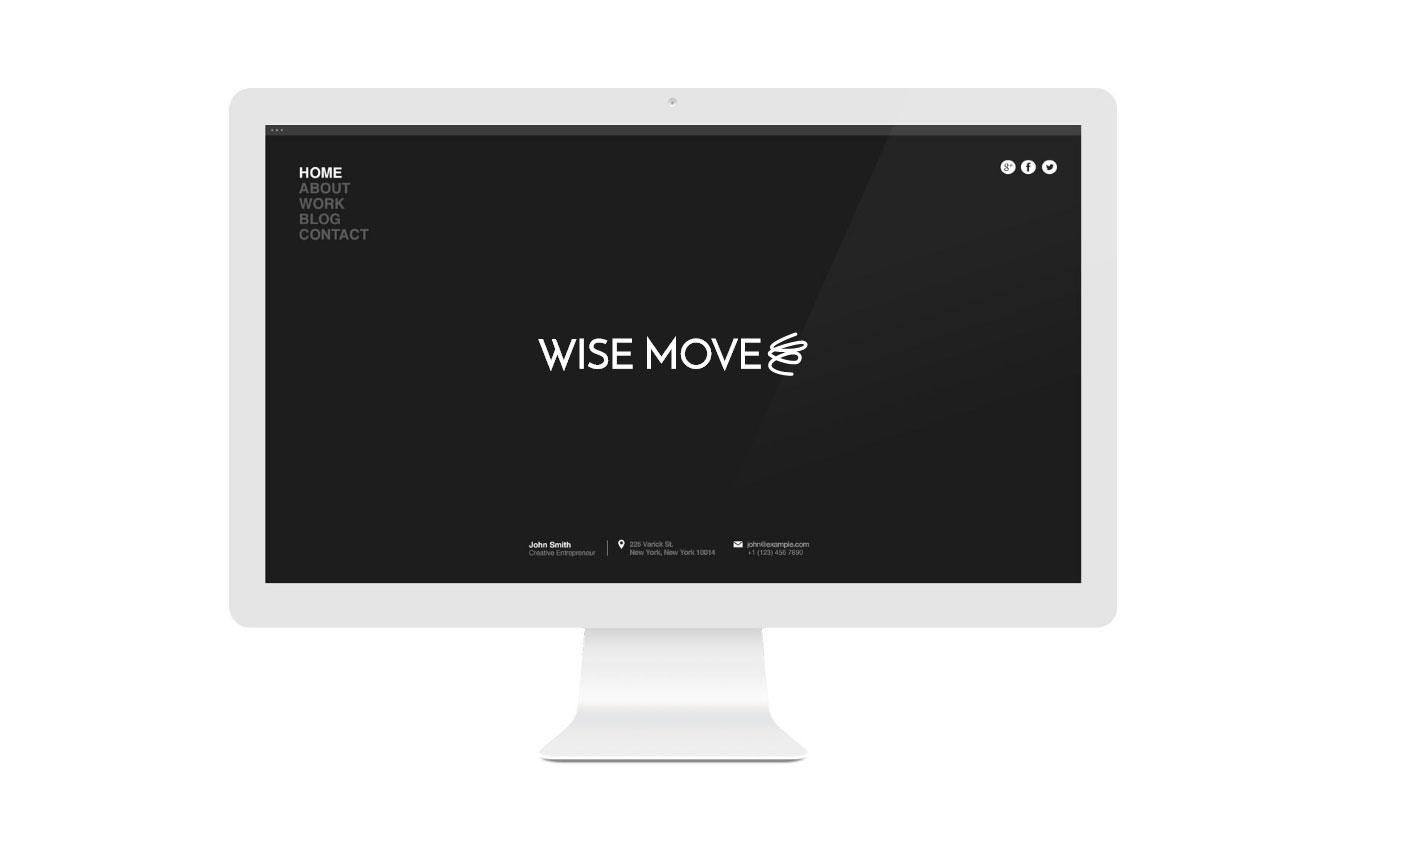 Wise_Move_Logos_13.jpg